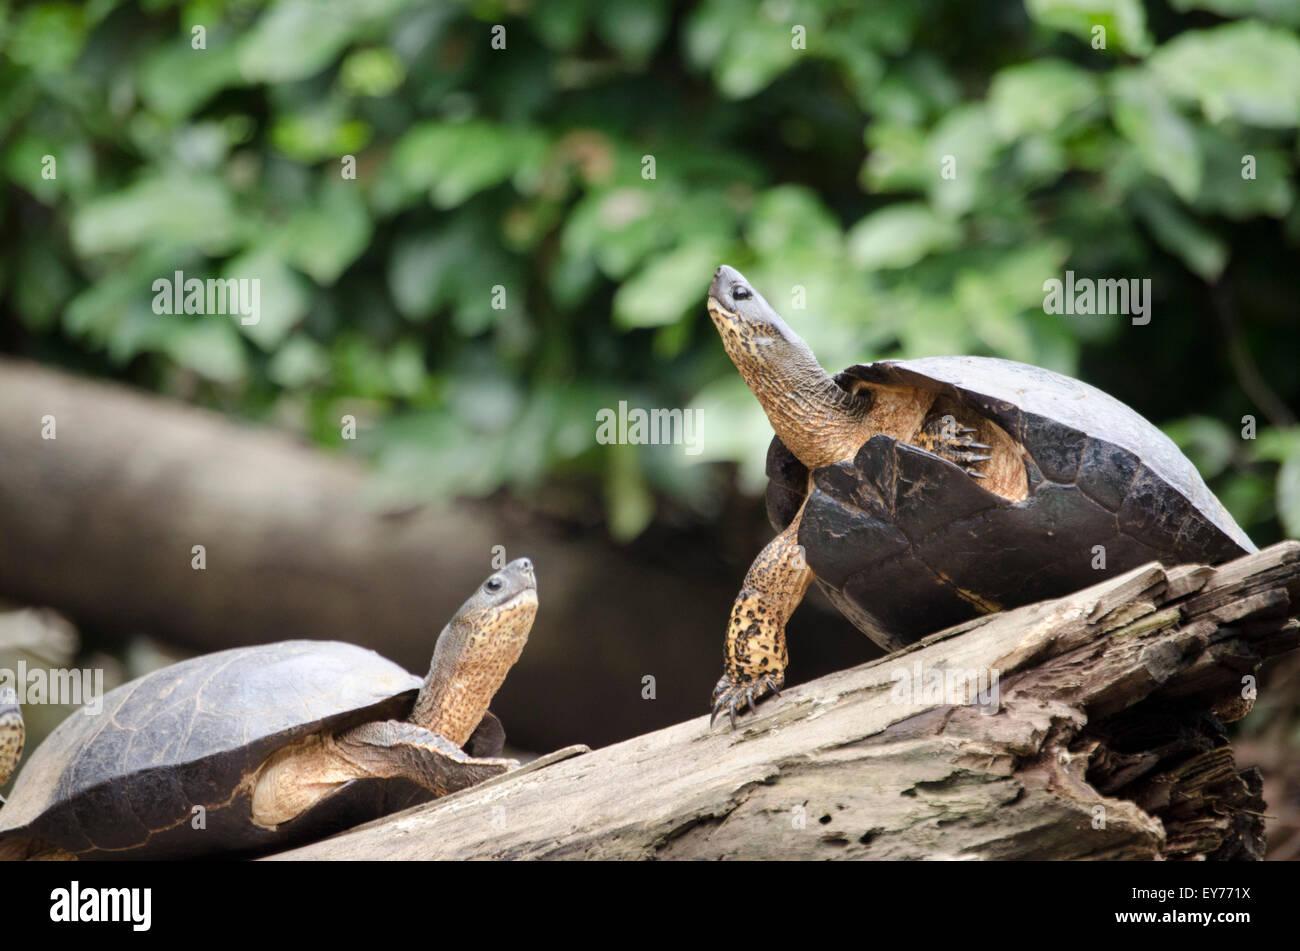 Turtle friends reach for the sun in the dense jungle of Costa Rica - Stock Image